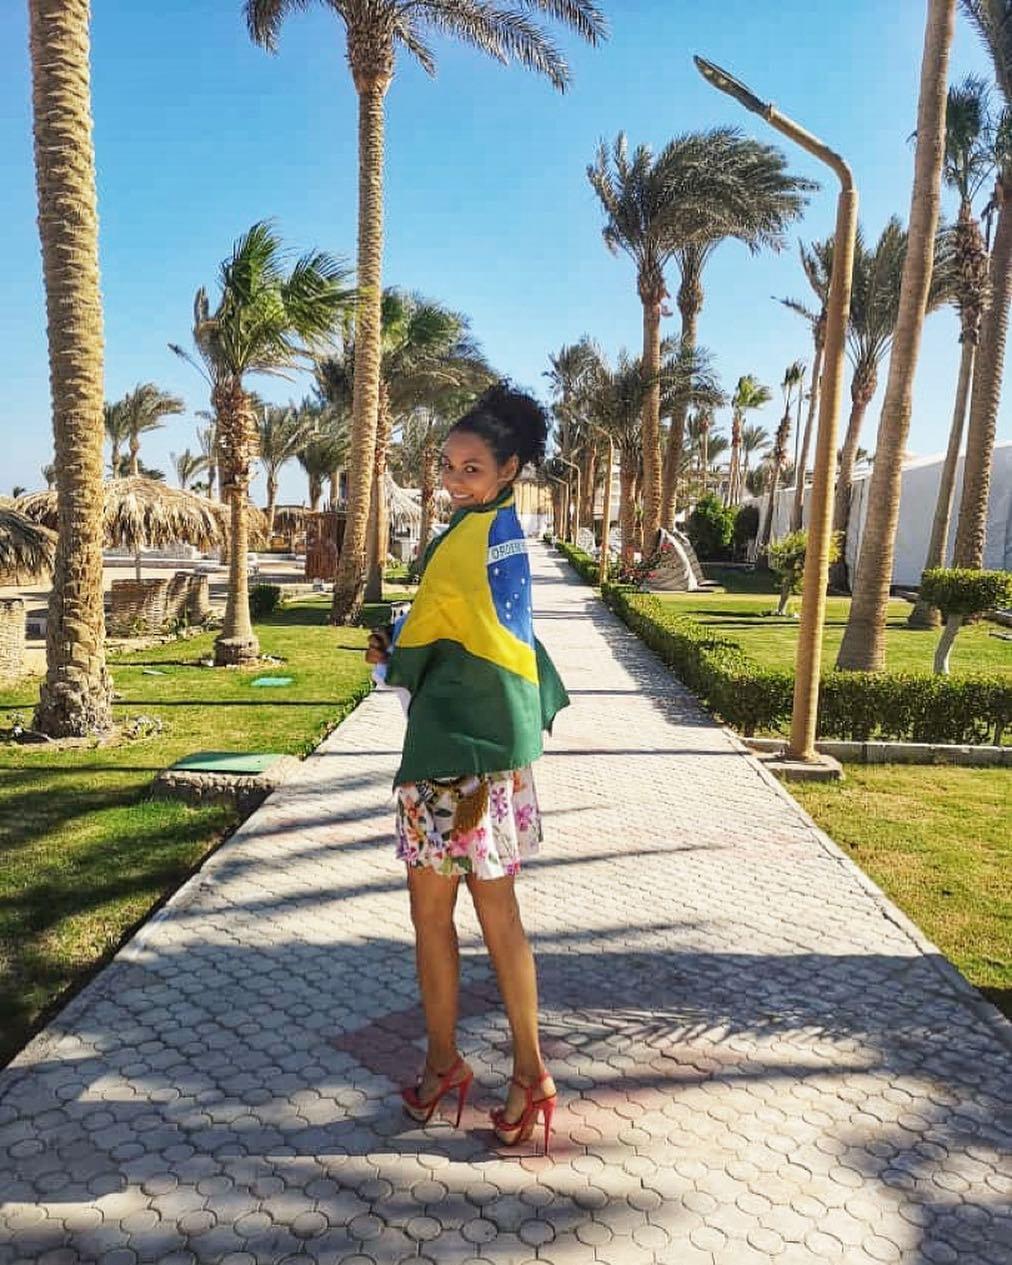 hosana elliot, semifinalista de top model of the world 2018/miss rio de janeiro 2014. - Página 2 Le5d3310